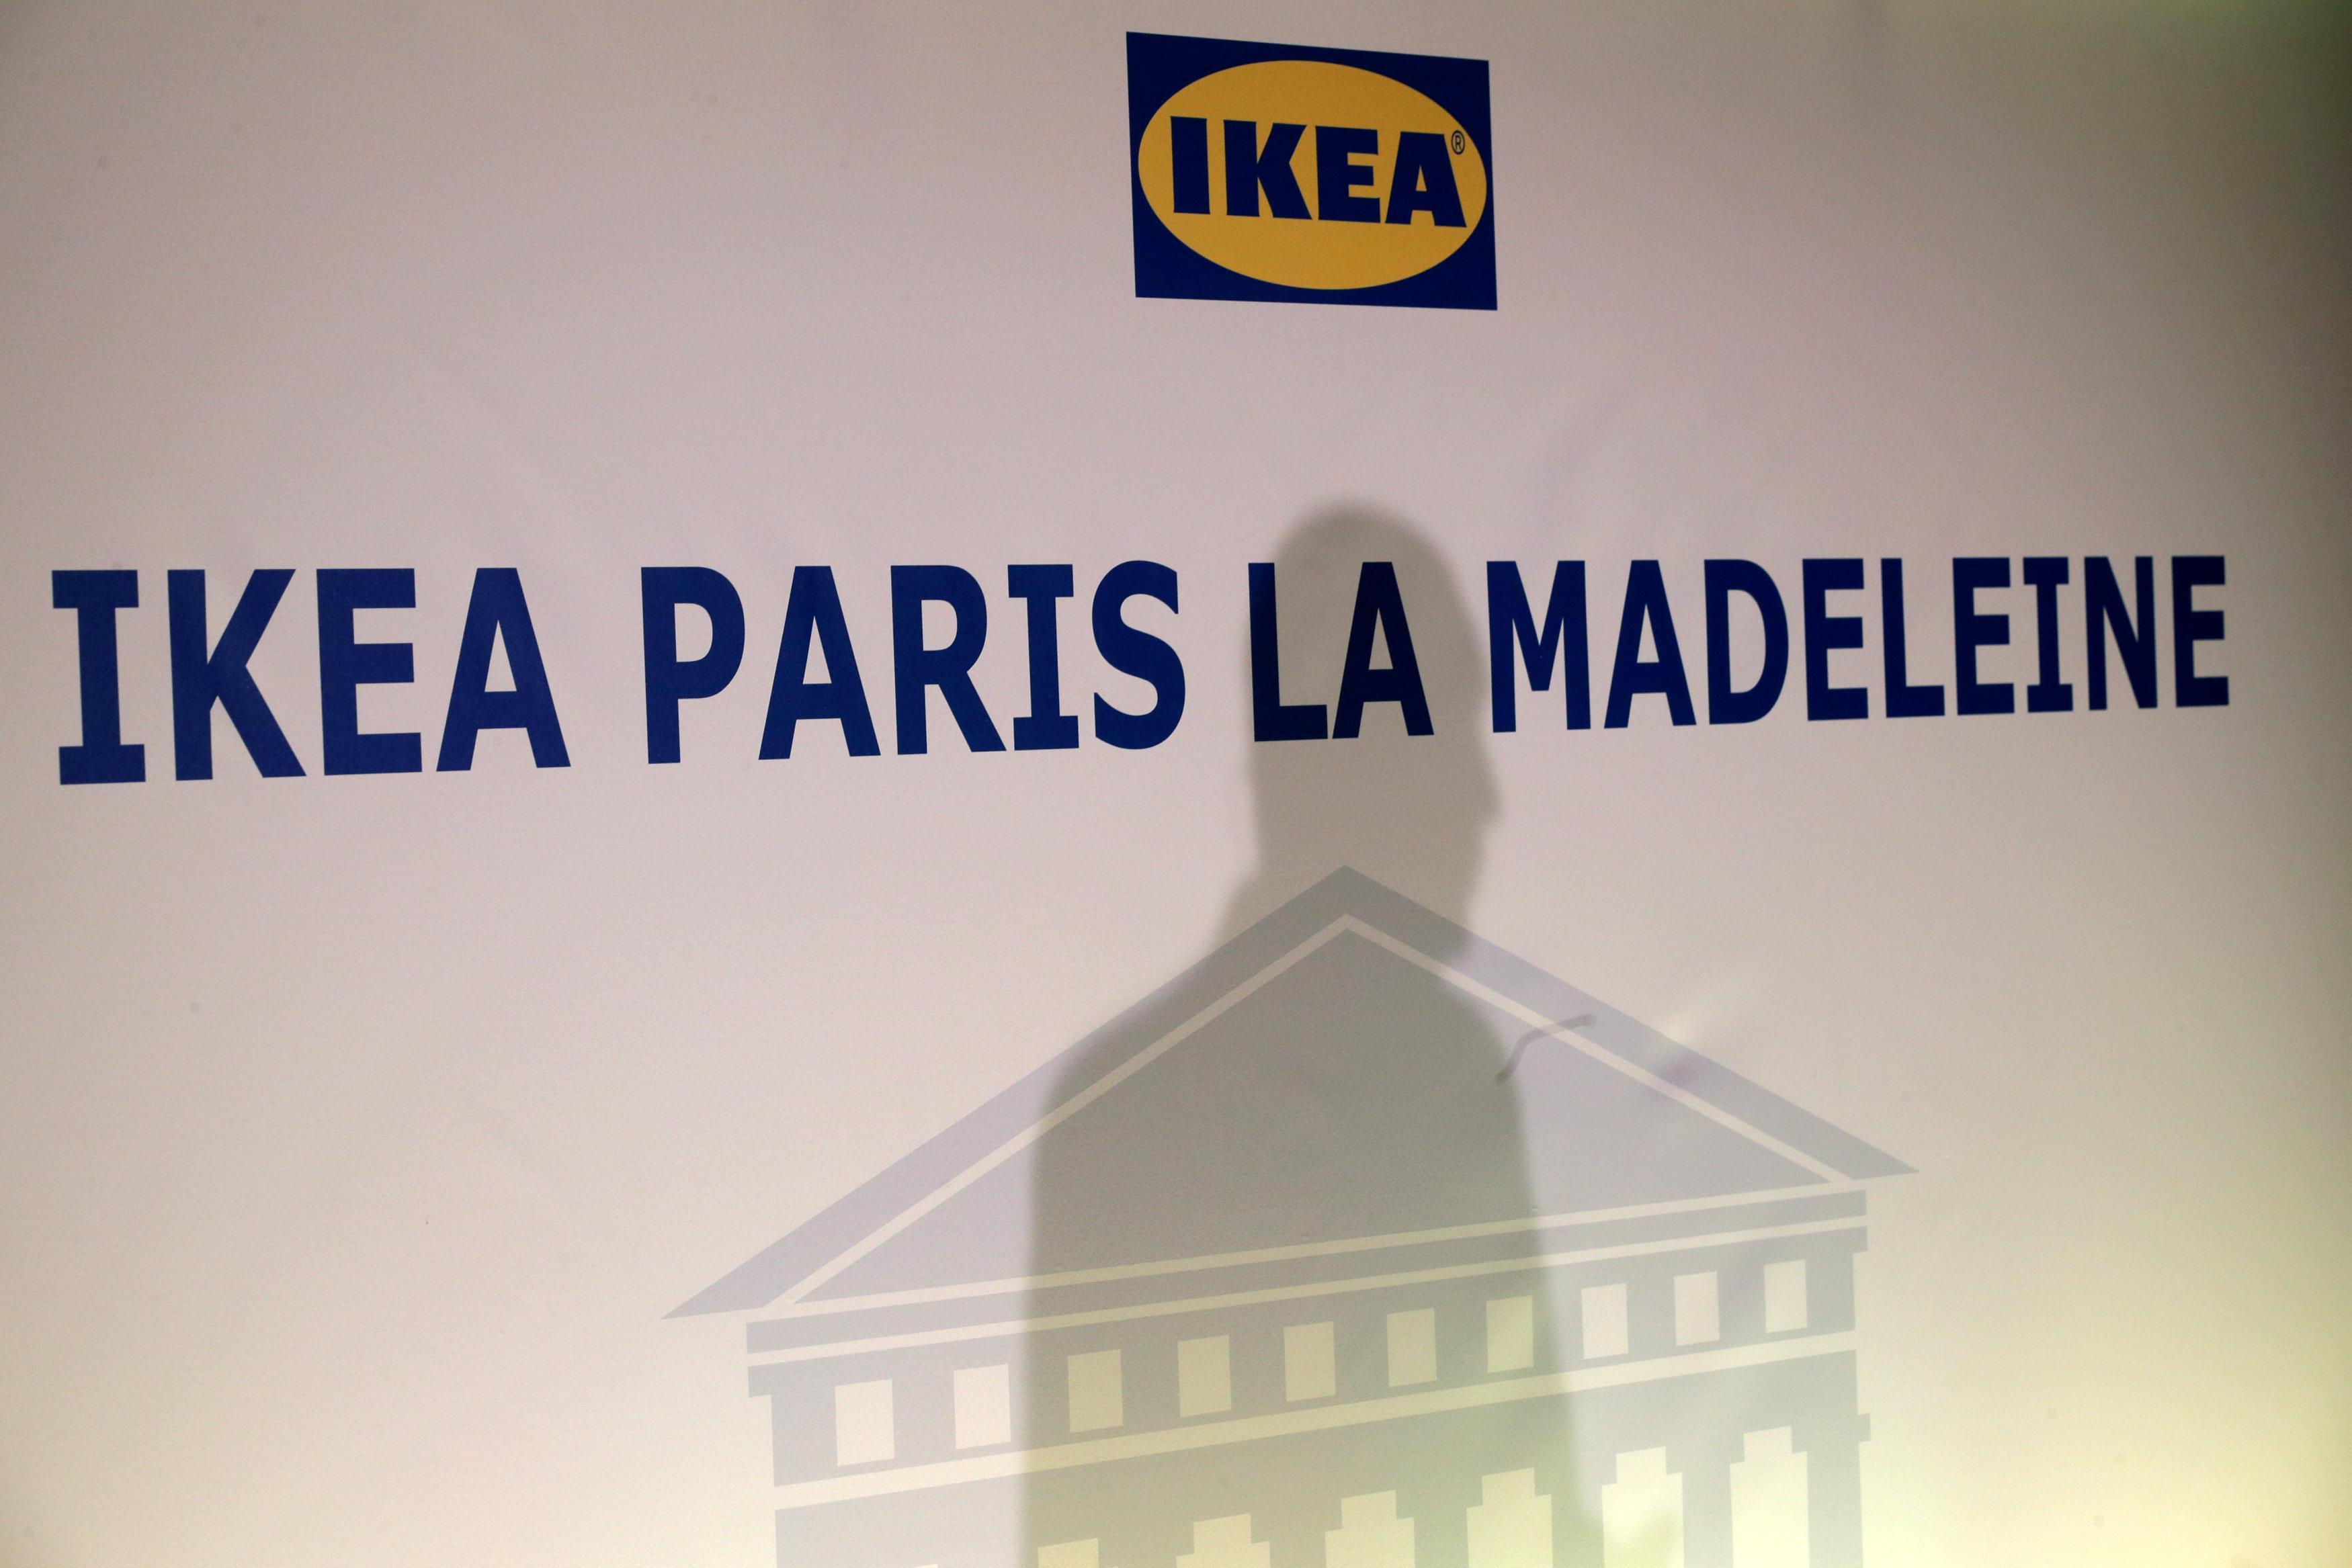 Cd Ladekast Ikea.Artikelen Over Ikea Telegraaf Nl